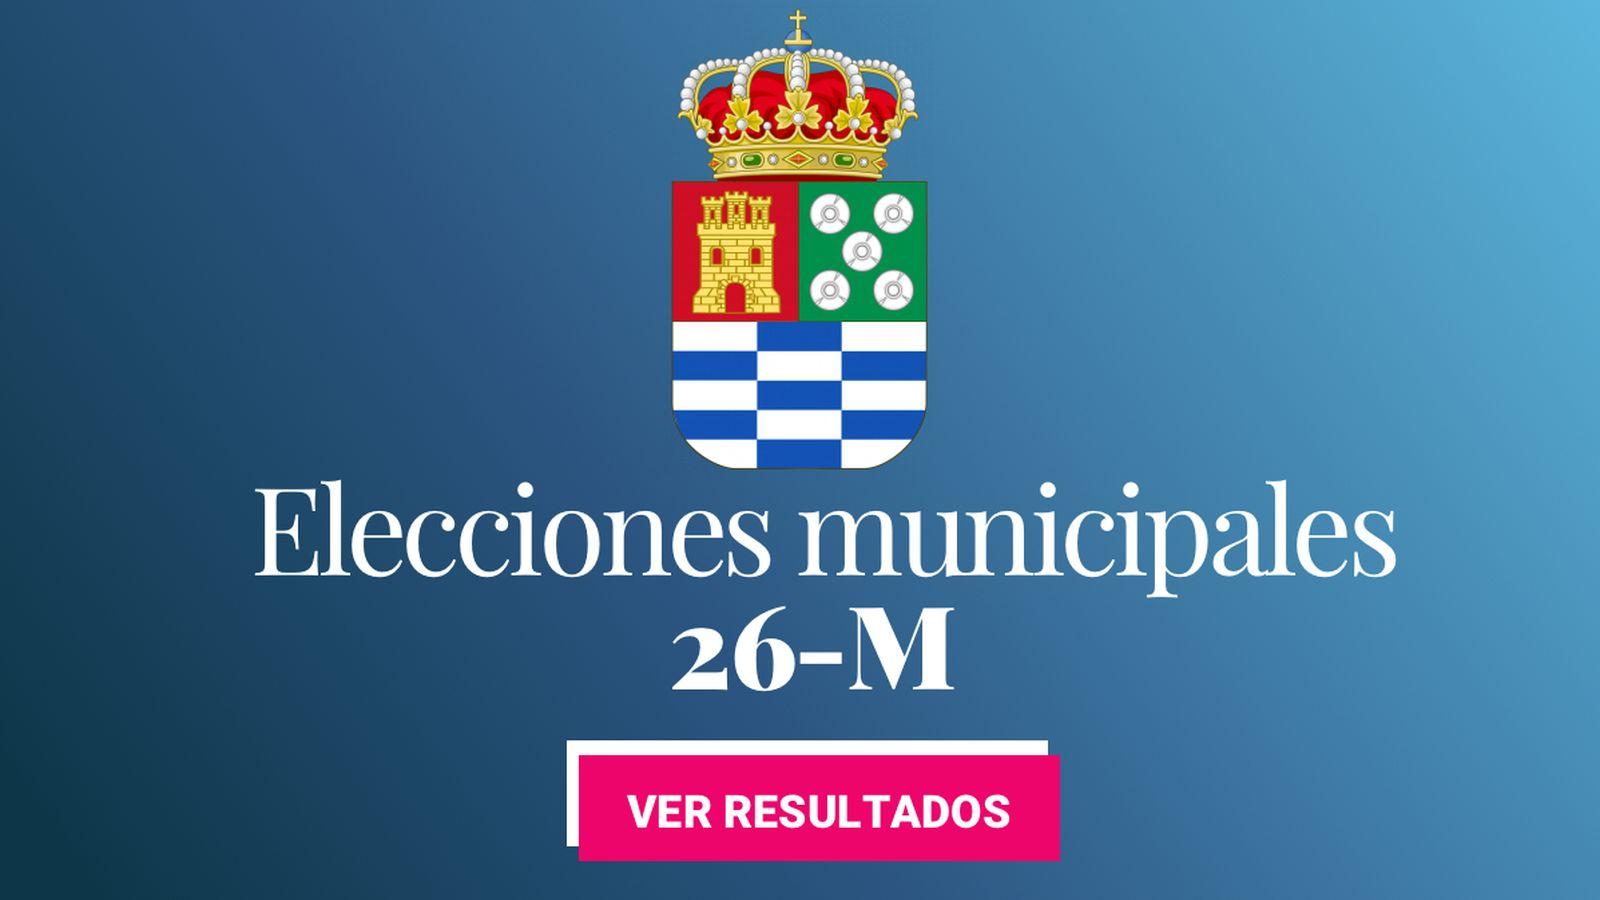 Foto: Elecciones municipales 2019 en Molina de Segura. (C.C./EC)